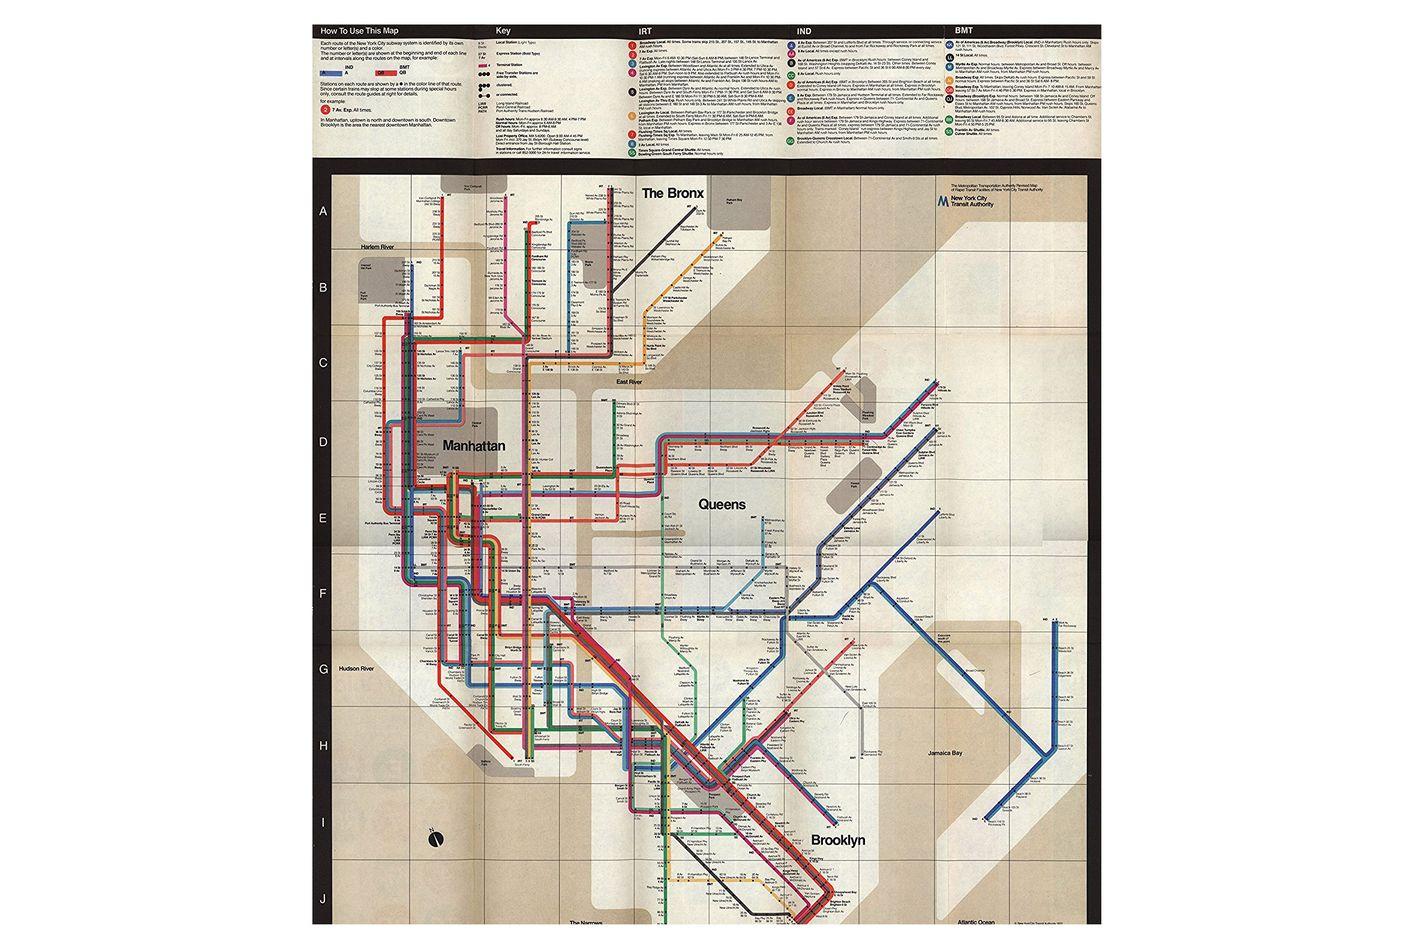 1972 Massimo Vignelli Subway Map